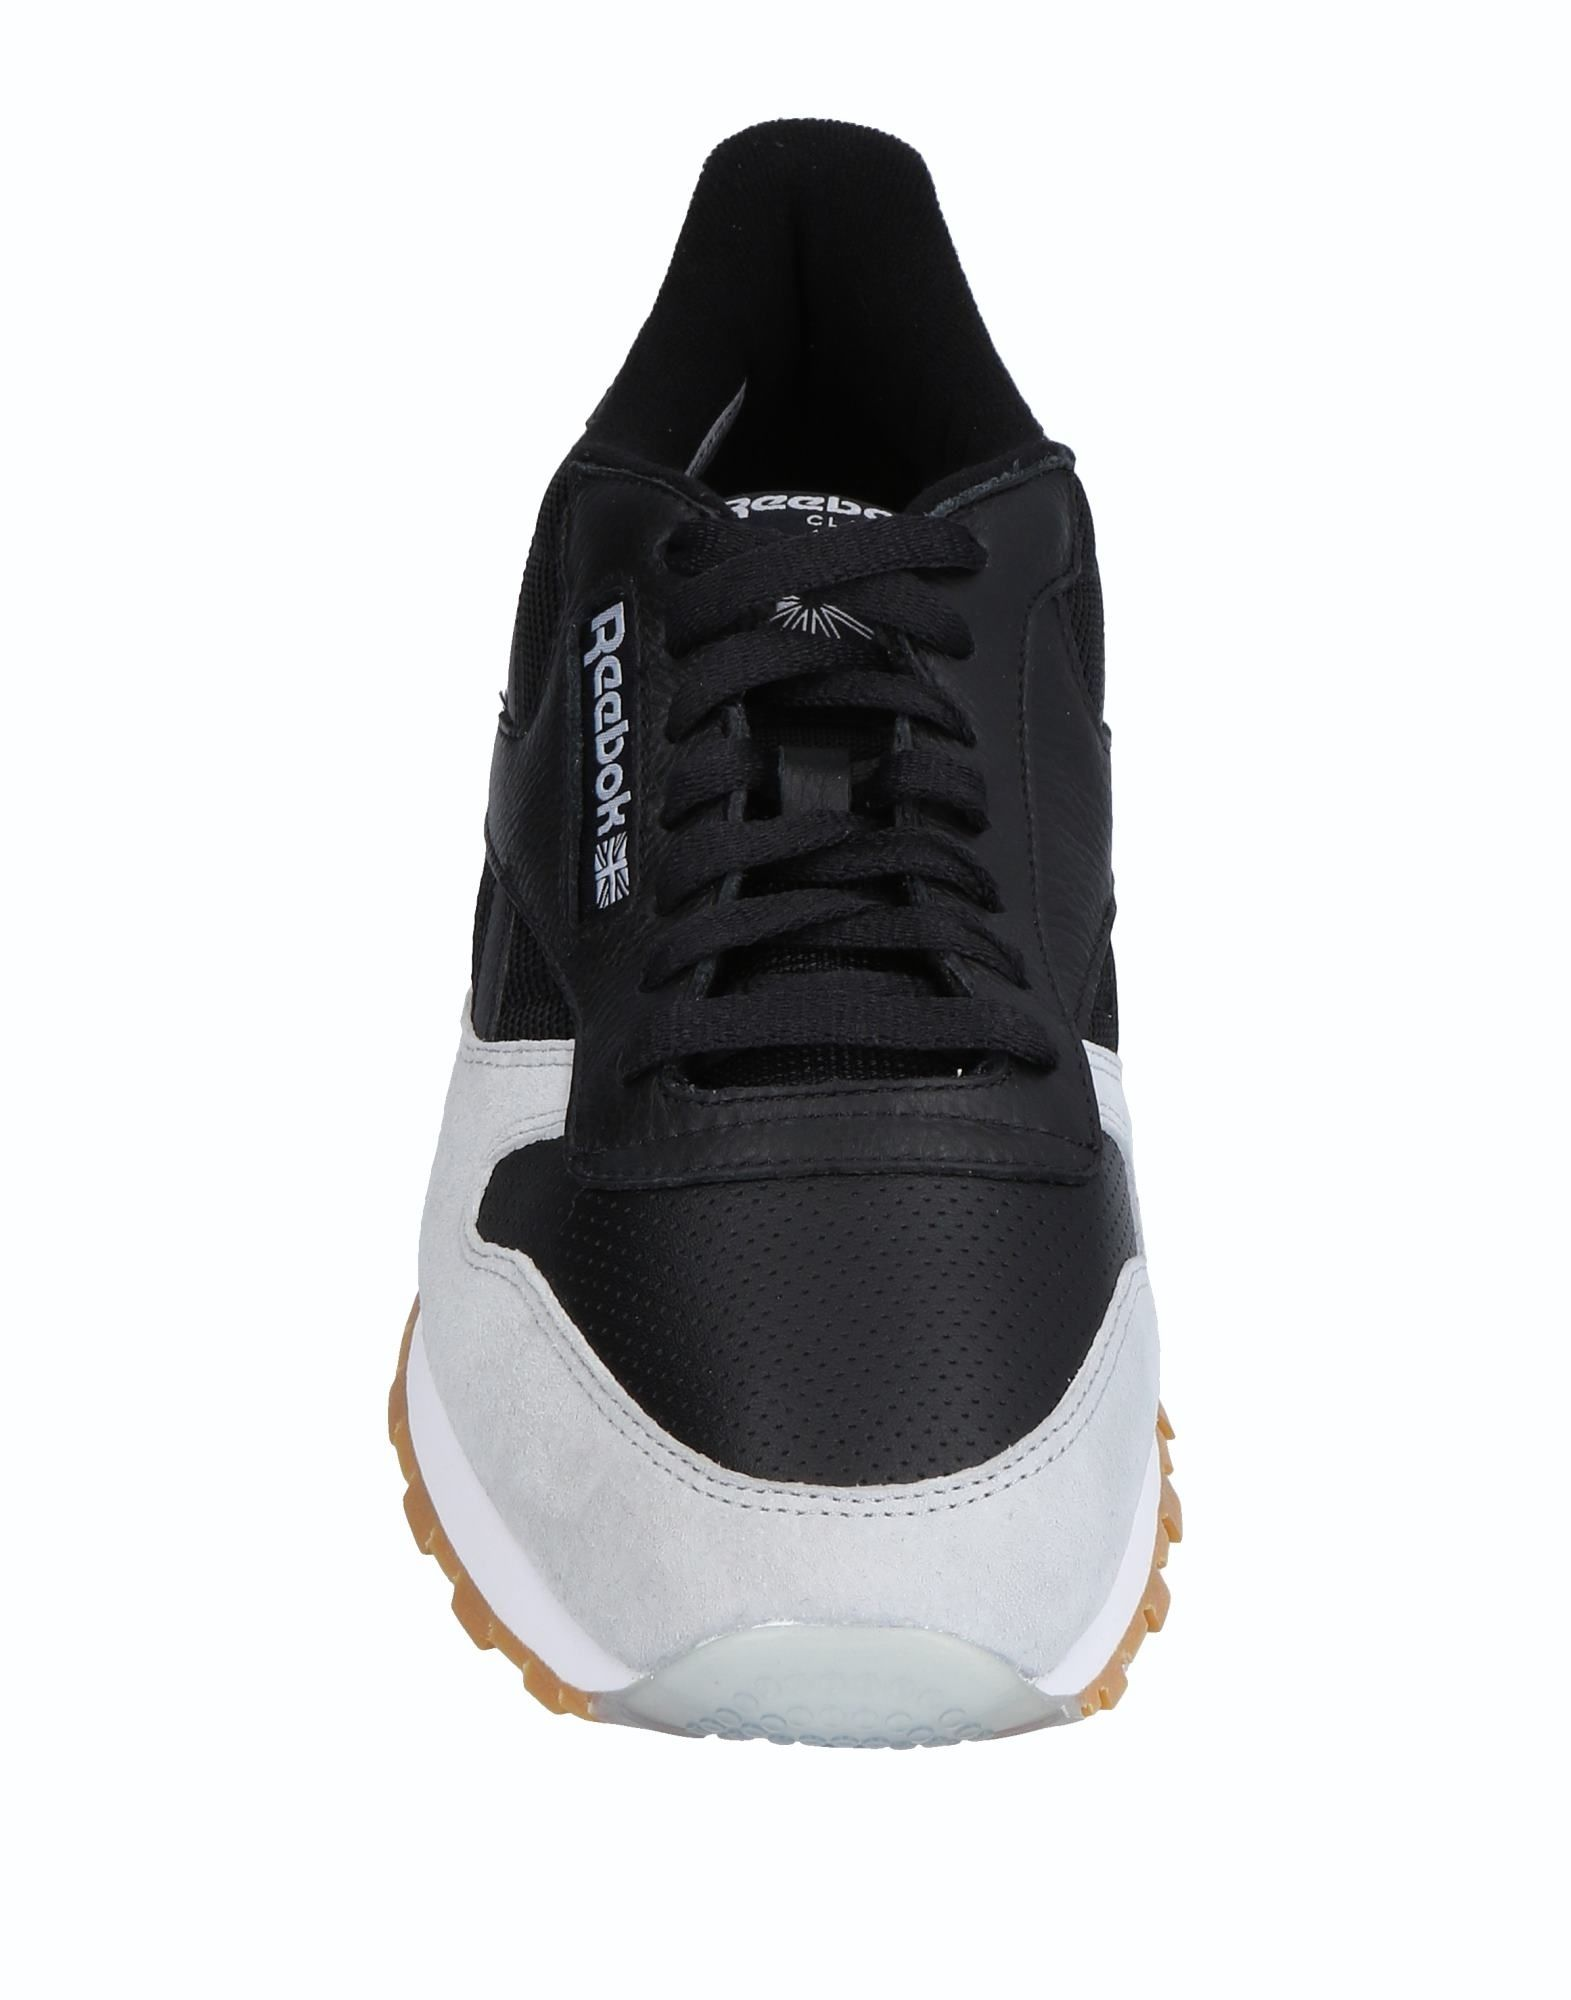 Rabatt echte  Schuhe Reebok Sneakers Herren  echte 11519080NC cfa8ba